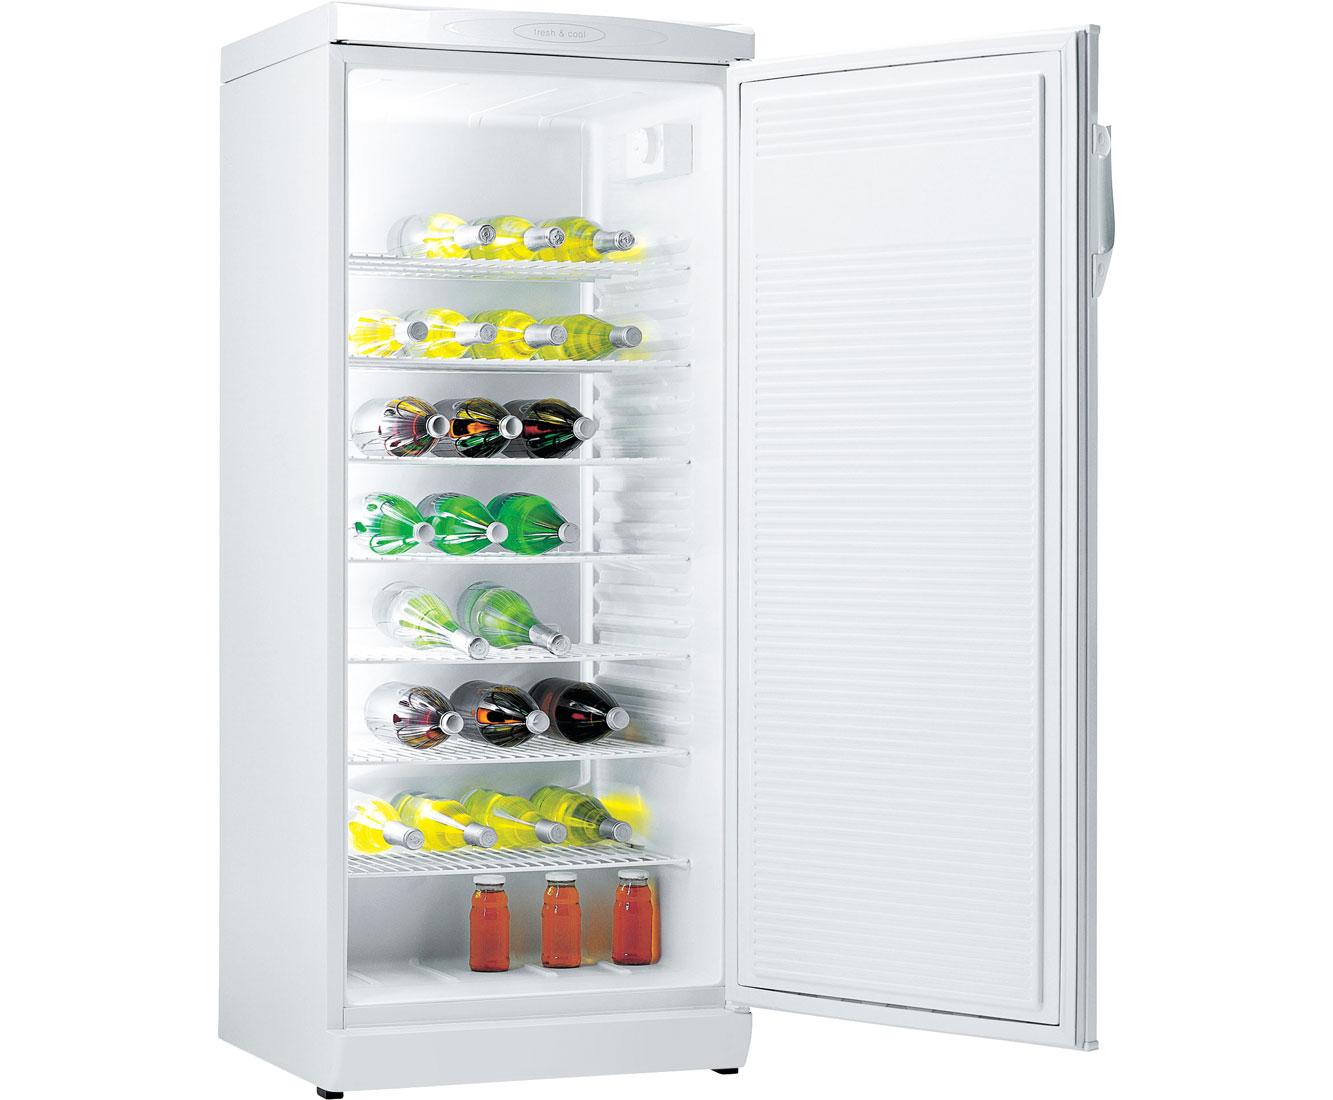 Gorenje Kühlschrank B Ware : Gorenje rvc w kühlschrank freistehend cm weiss neu ebay